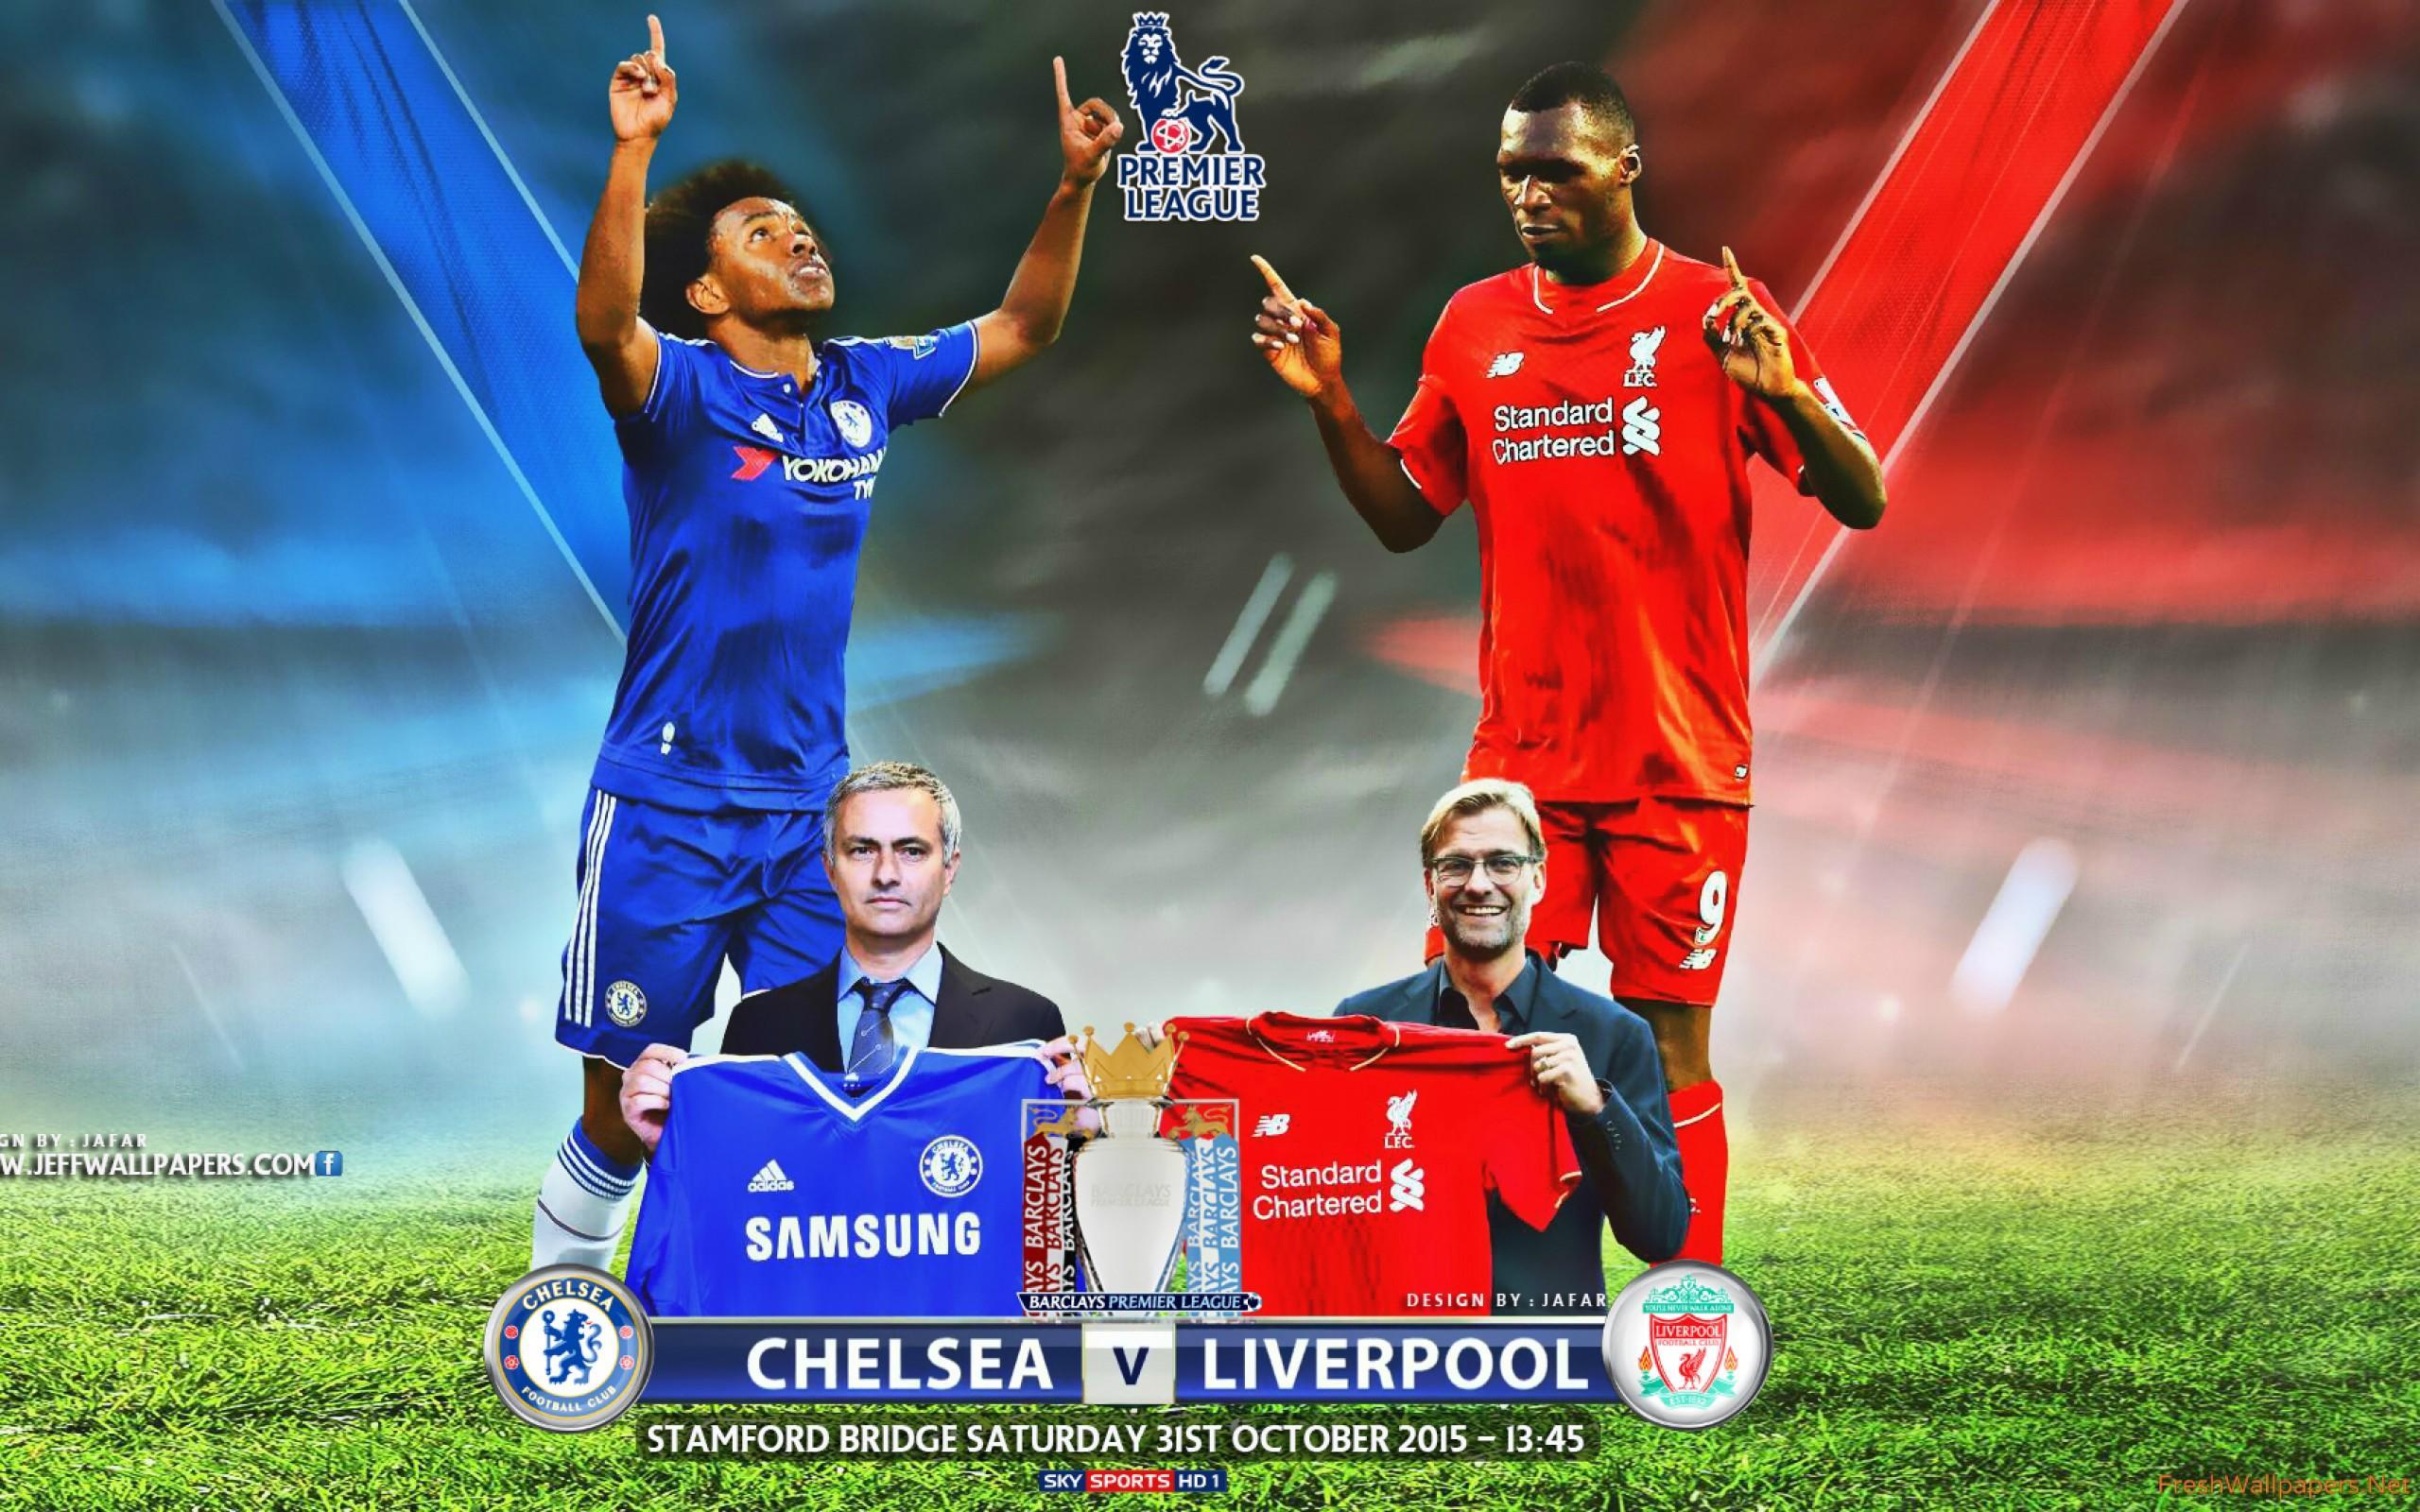 Download Wallpaper Liverpool Vs Chelsea HD